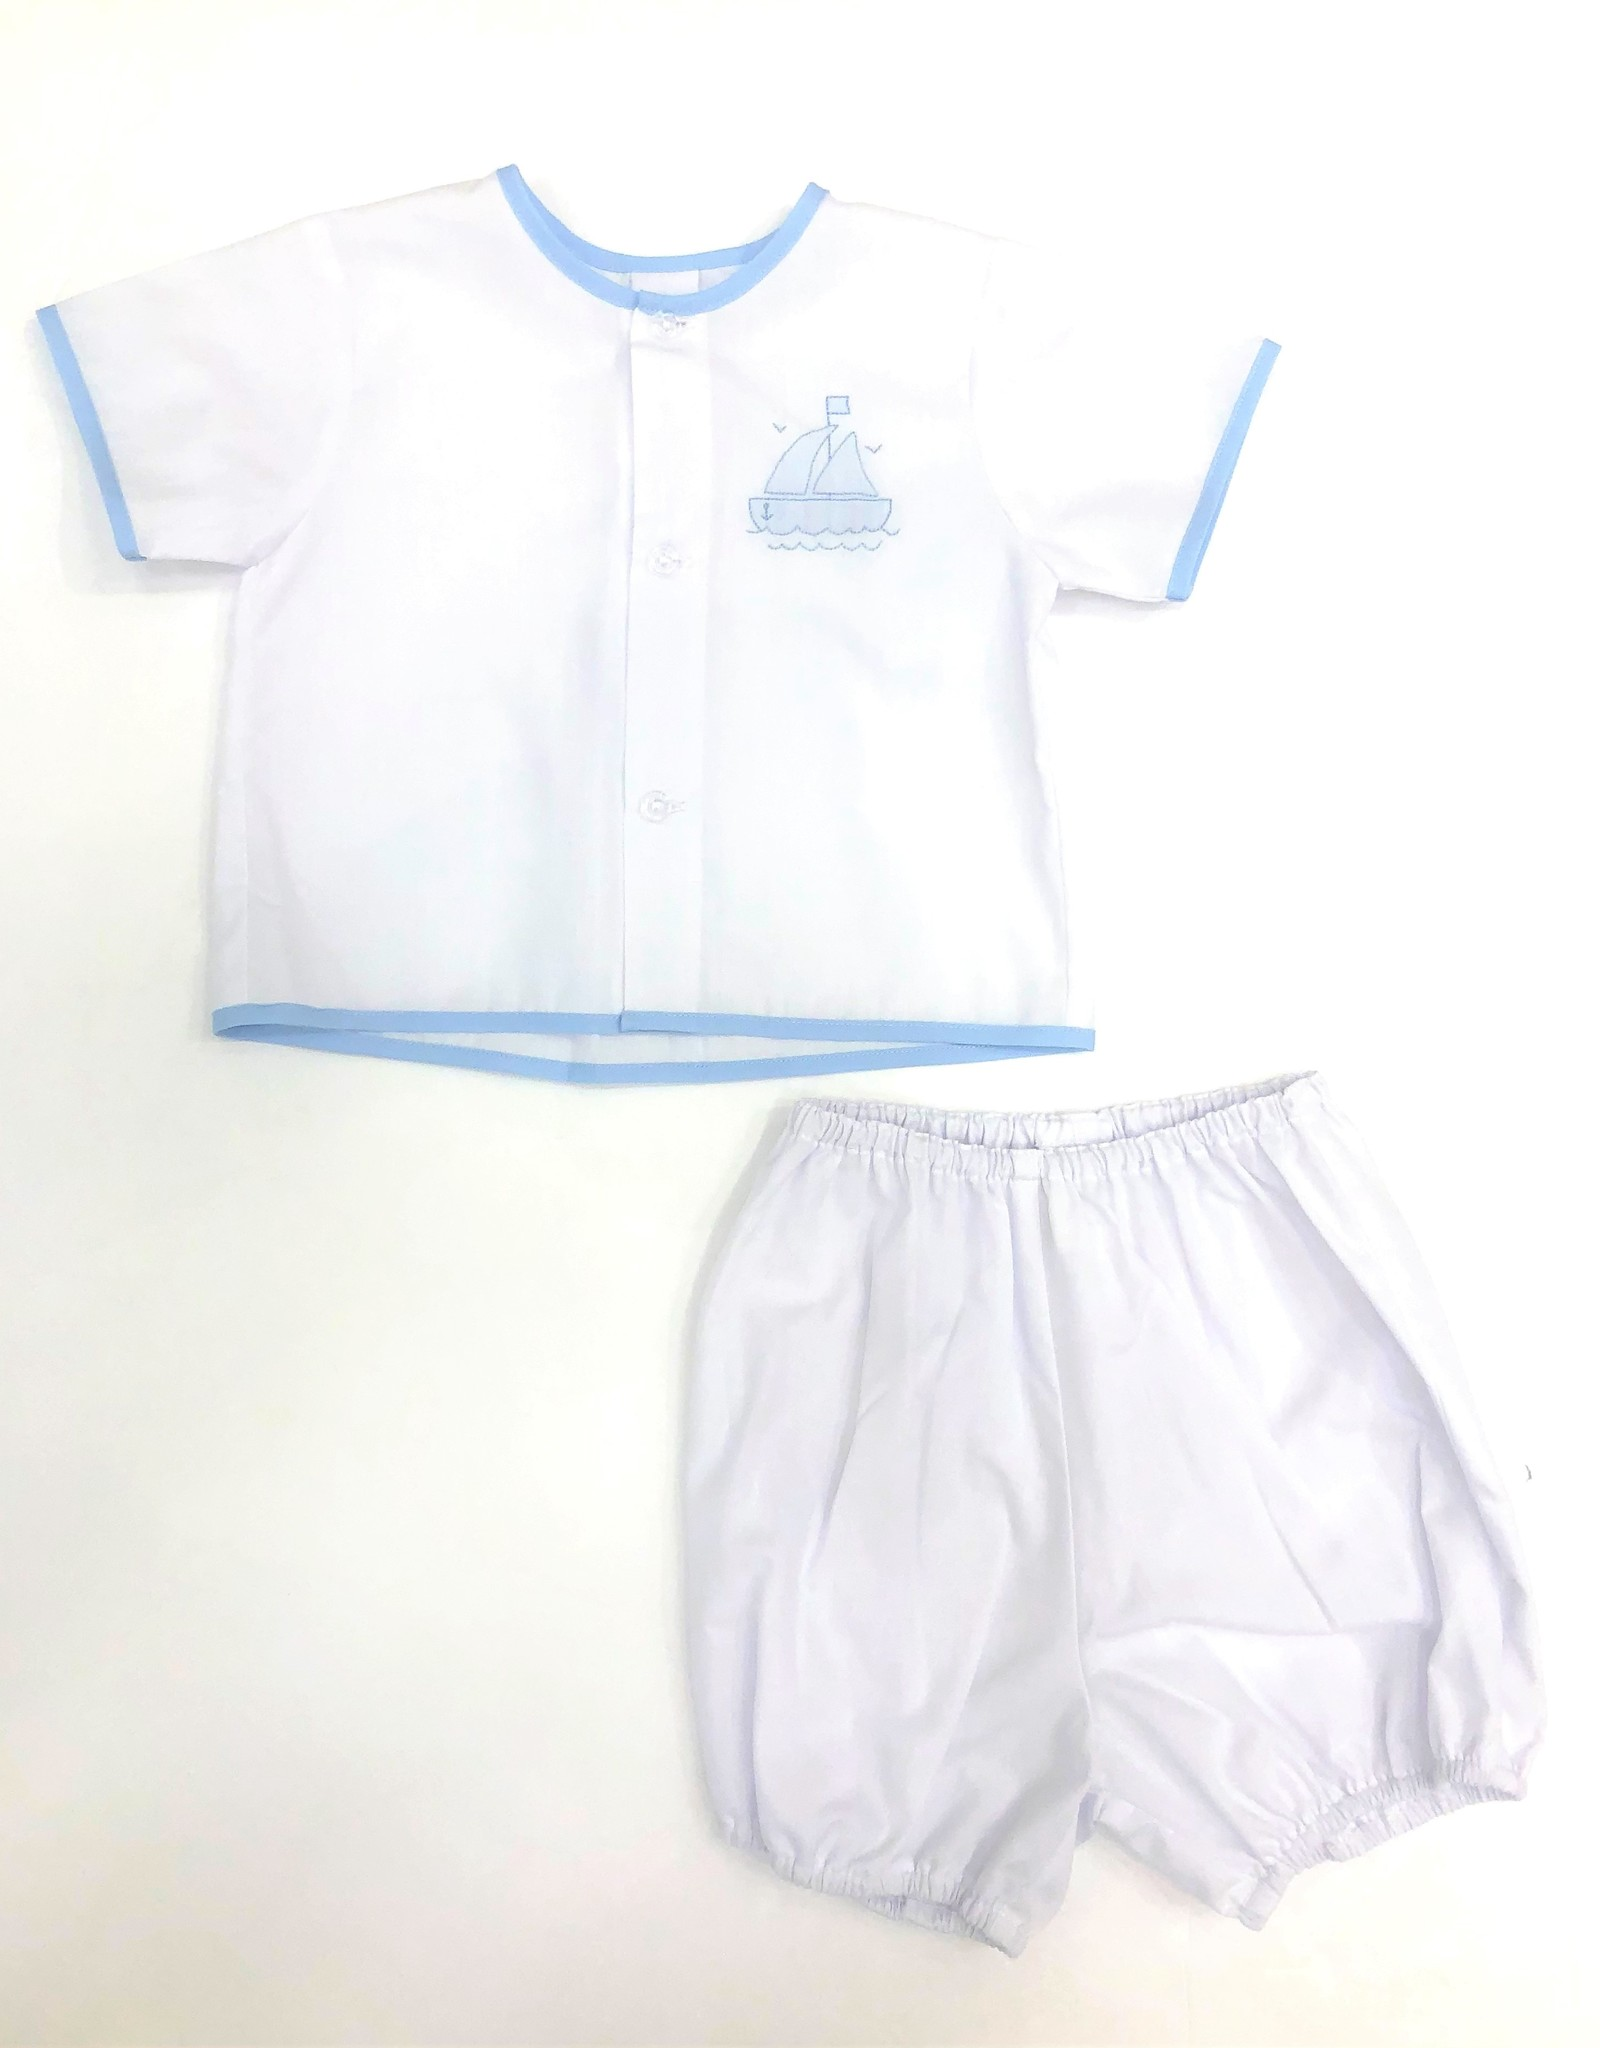 Auraluz 2 PC Embroidered Boat Boy Set White/Blue